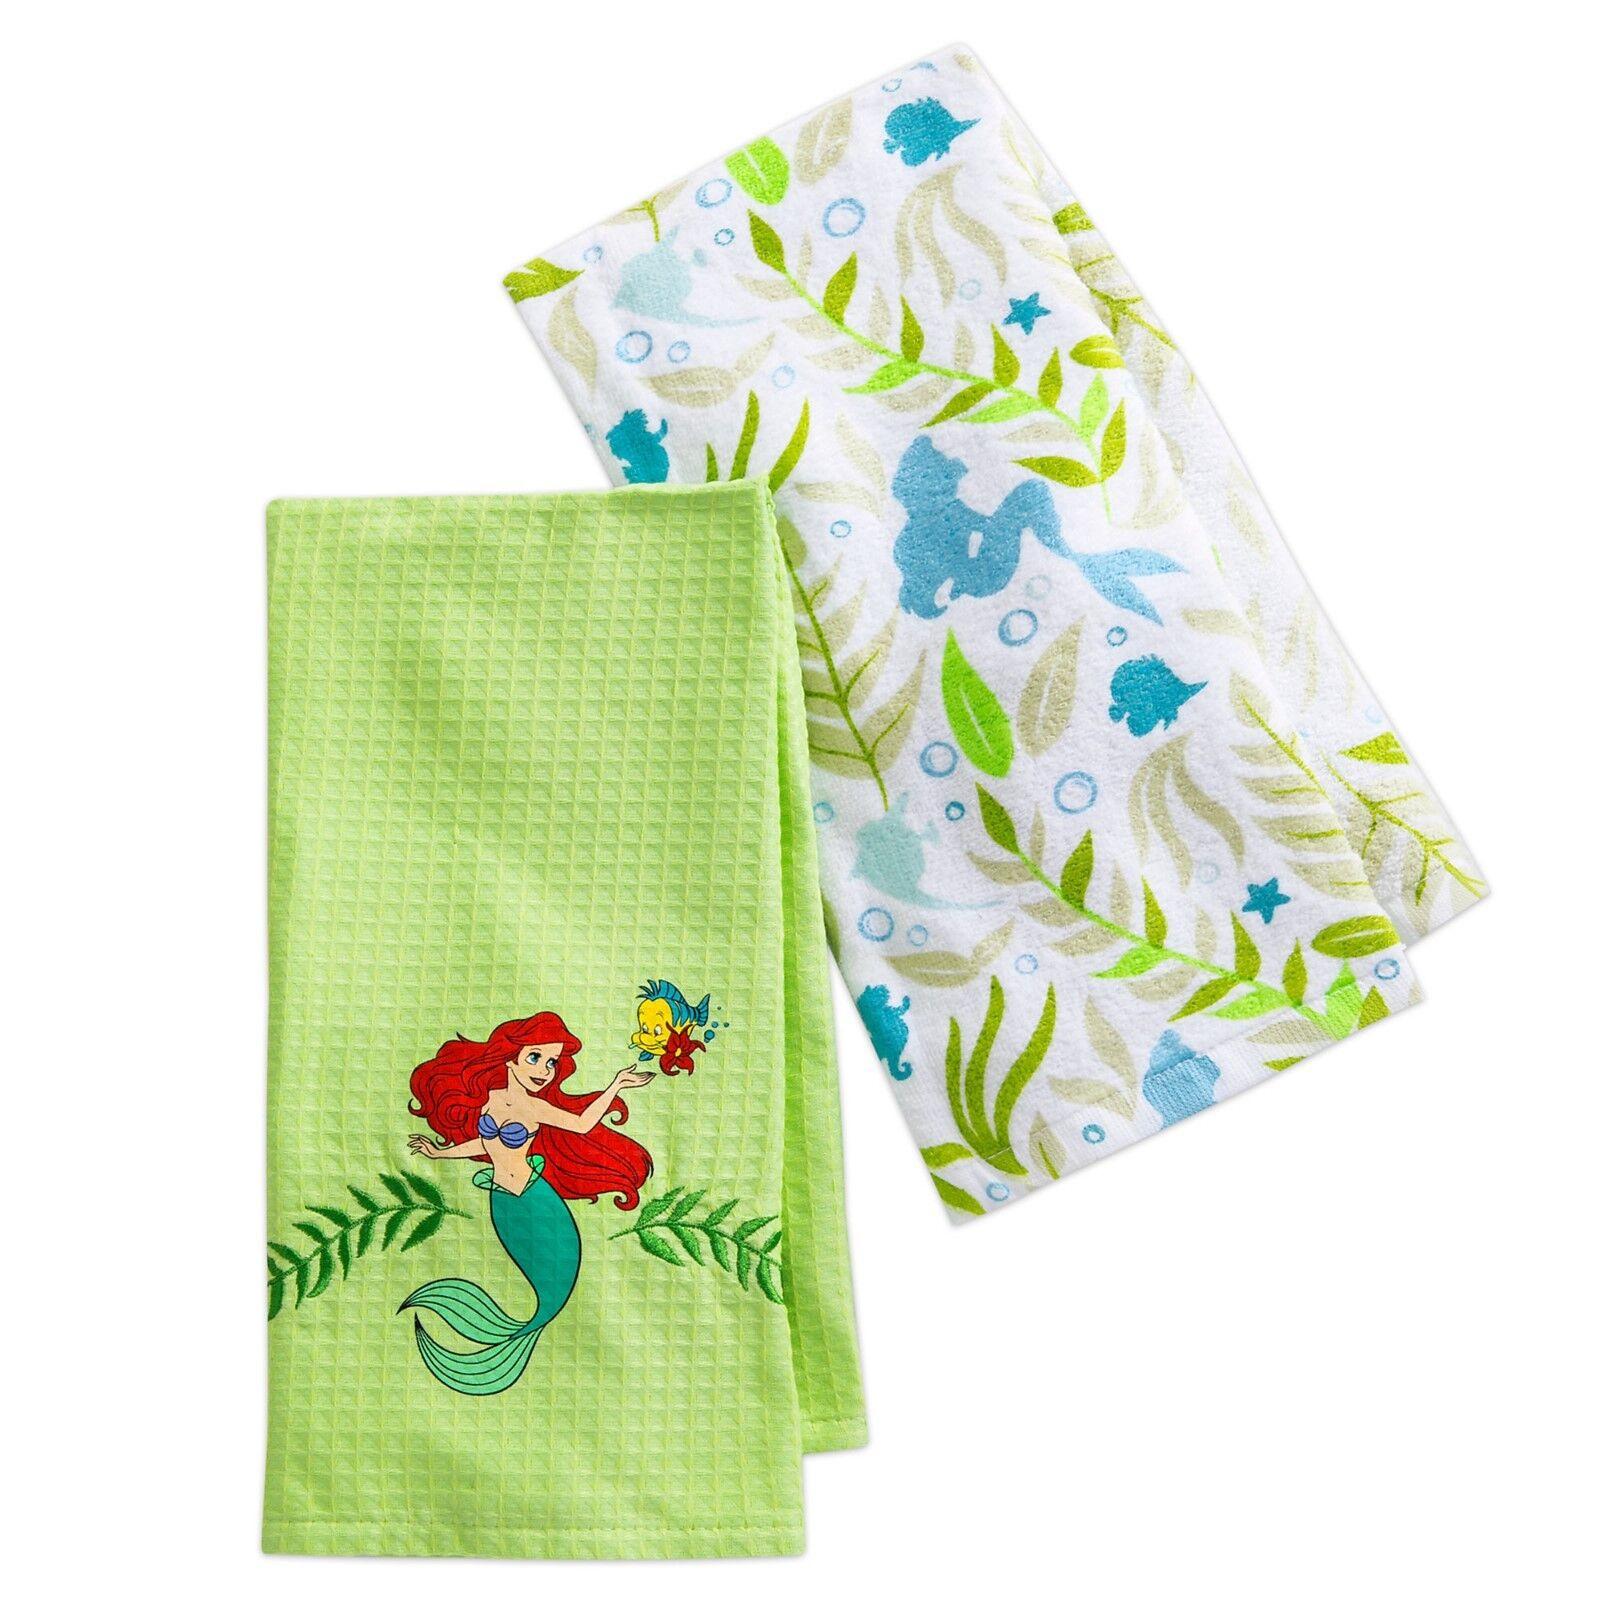 Disney Parks The Little Mermaid Ariel and Flounder Kitchen T